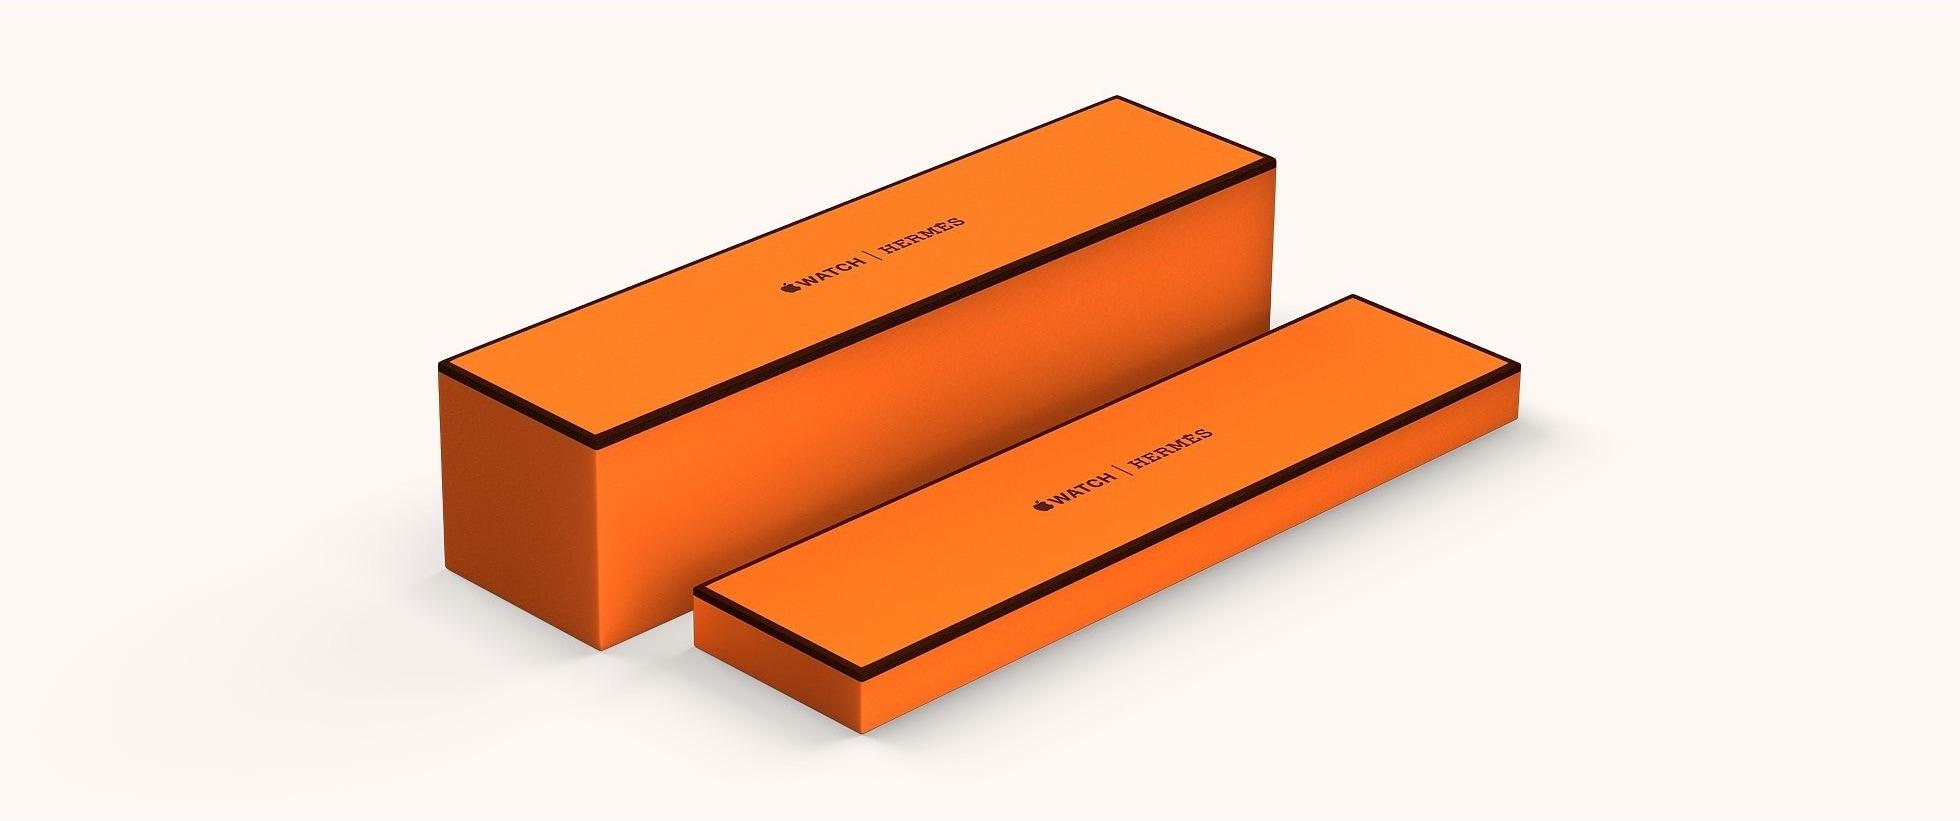 Caixa do Apple Watch Hermès